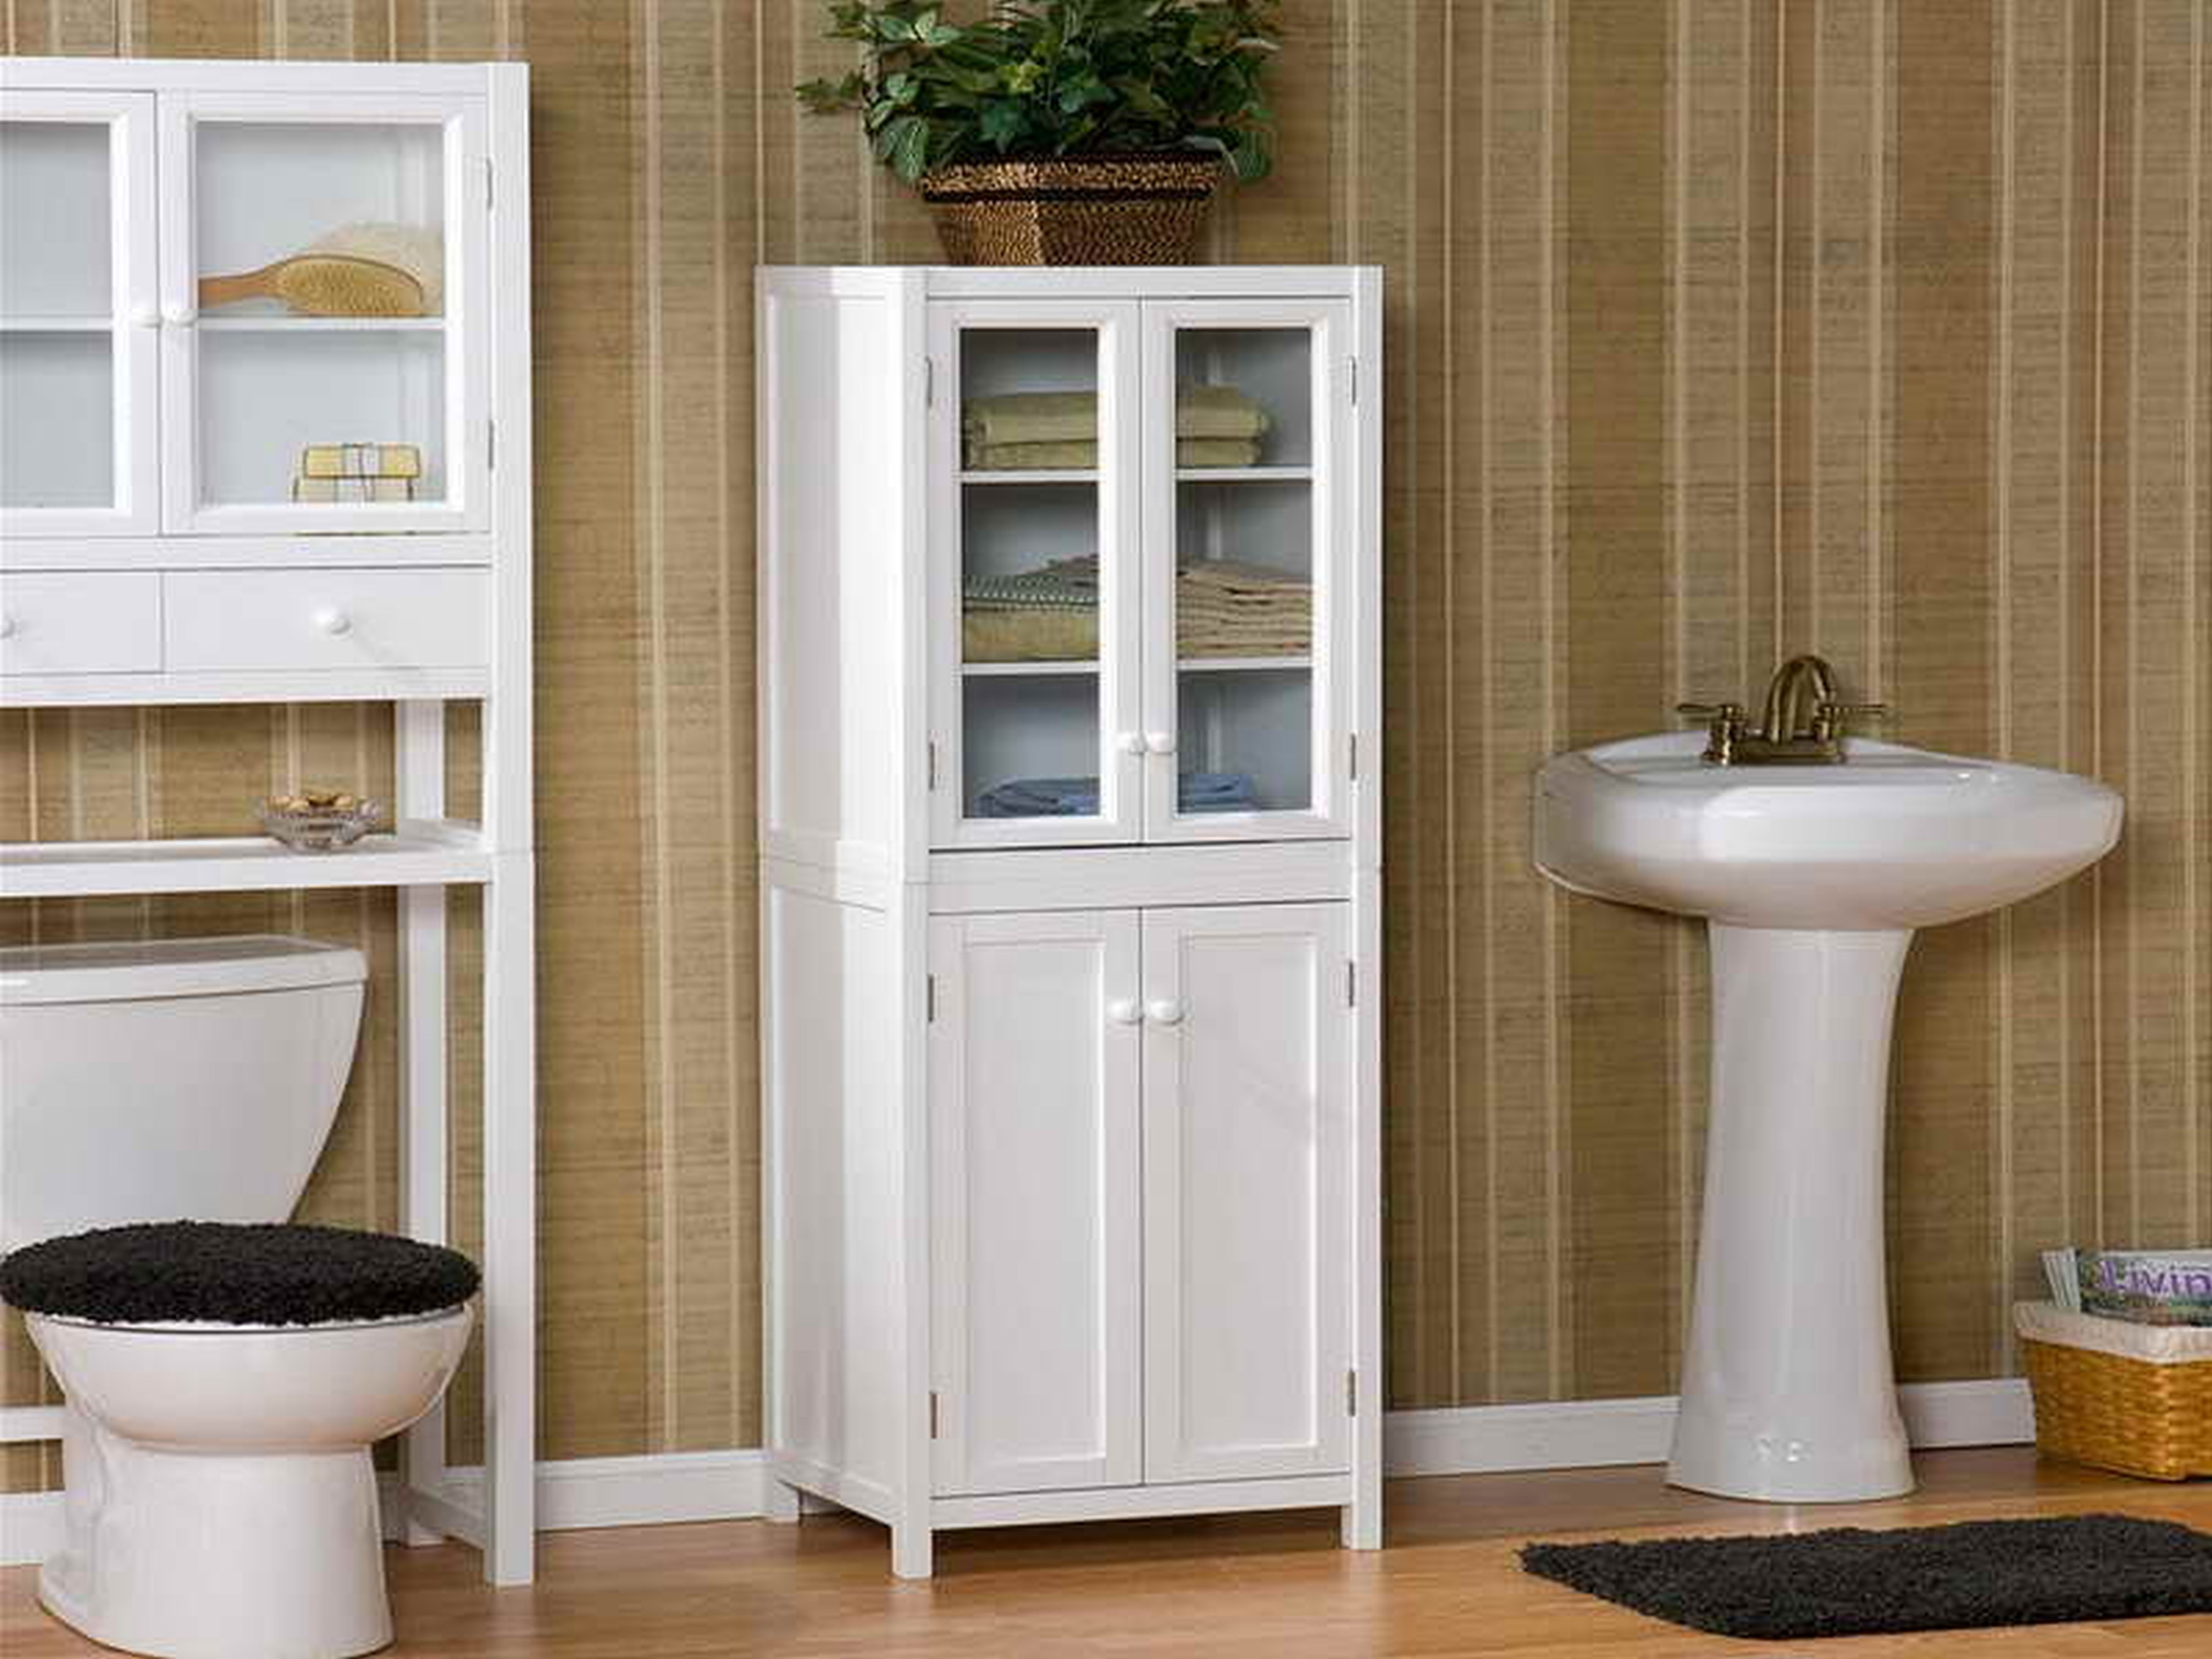 Wunderbar Bathroom Storage Cabinet On Wheels Countertop for dimensions 5000 X 3750